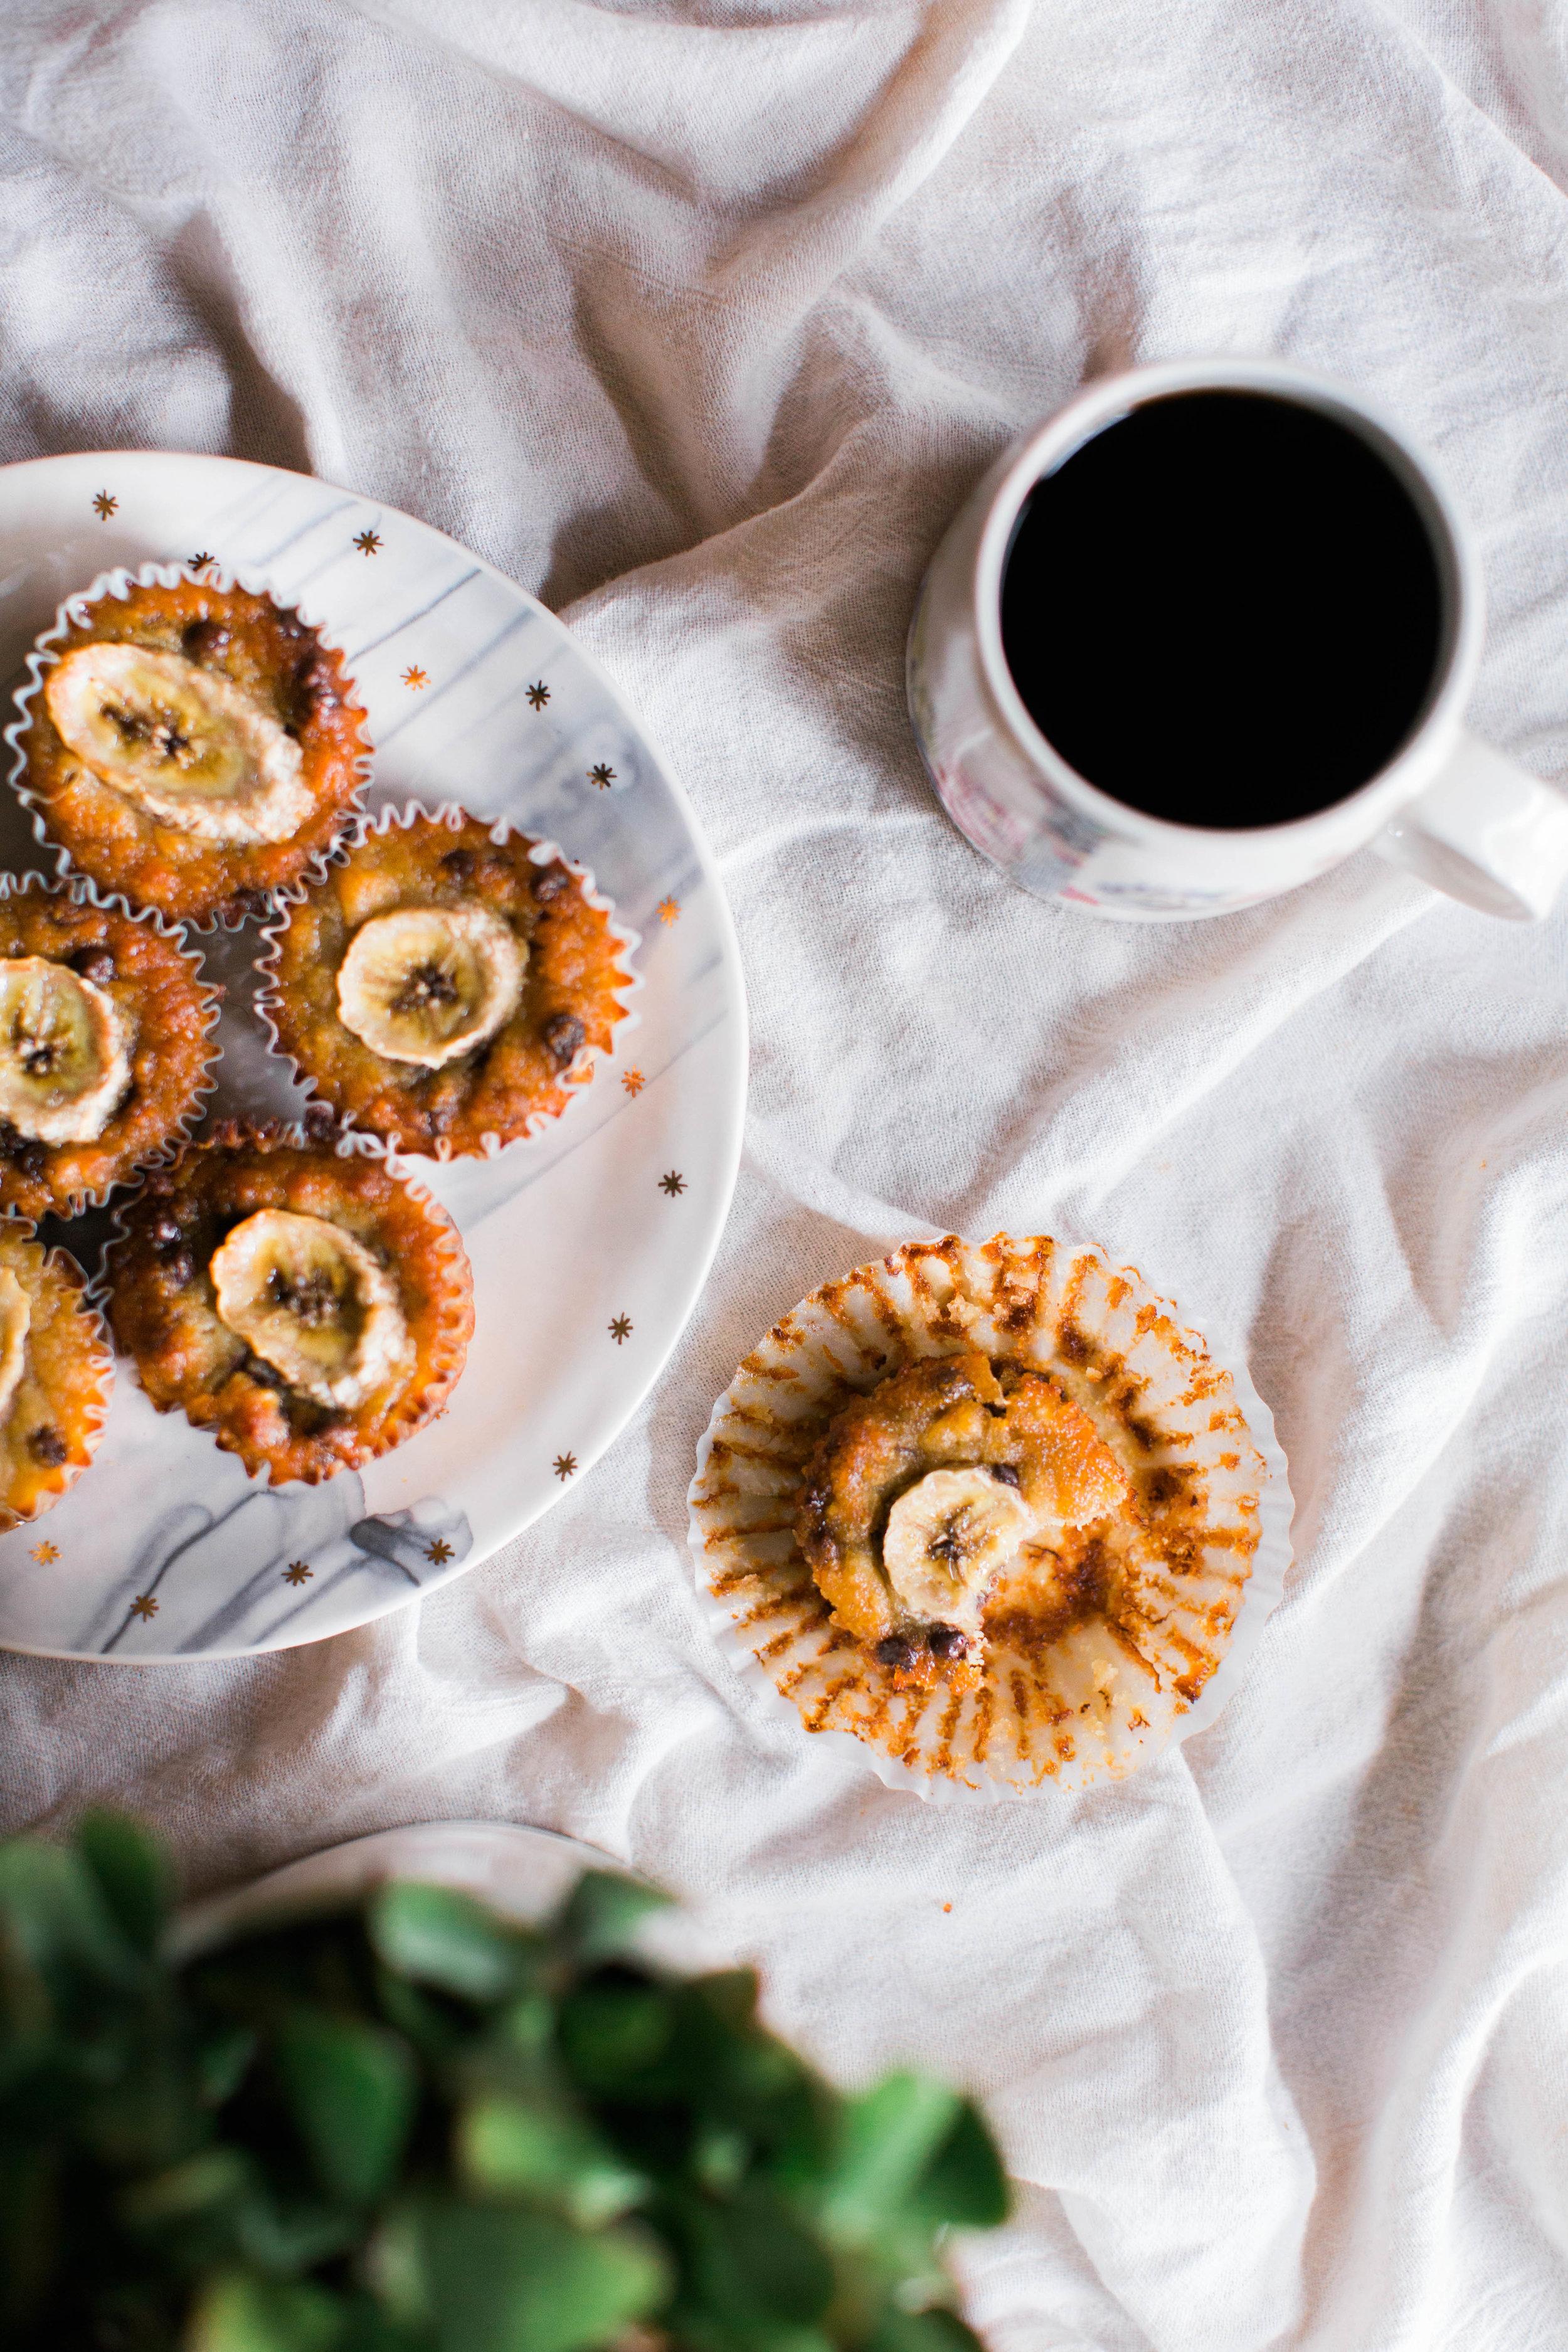 jennahazelphotography-paleo-banana-chocolate-chip-muffins-1151.jpg